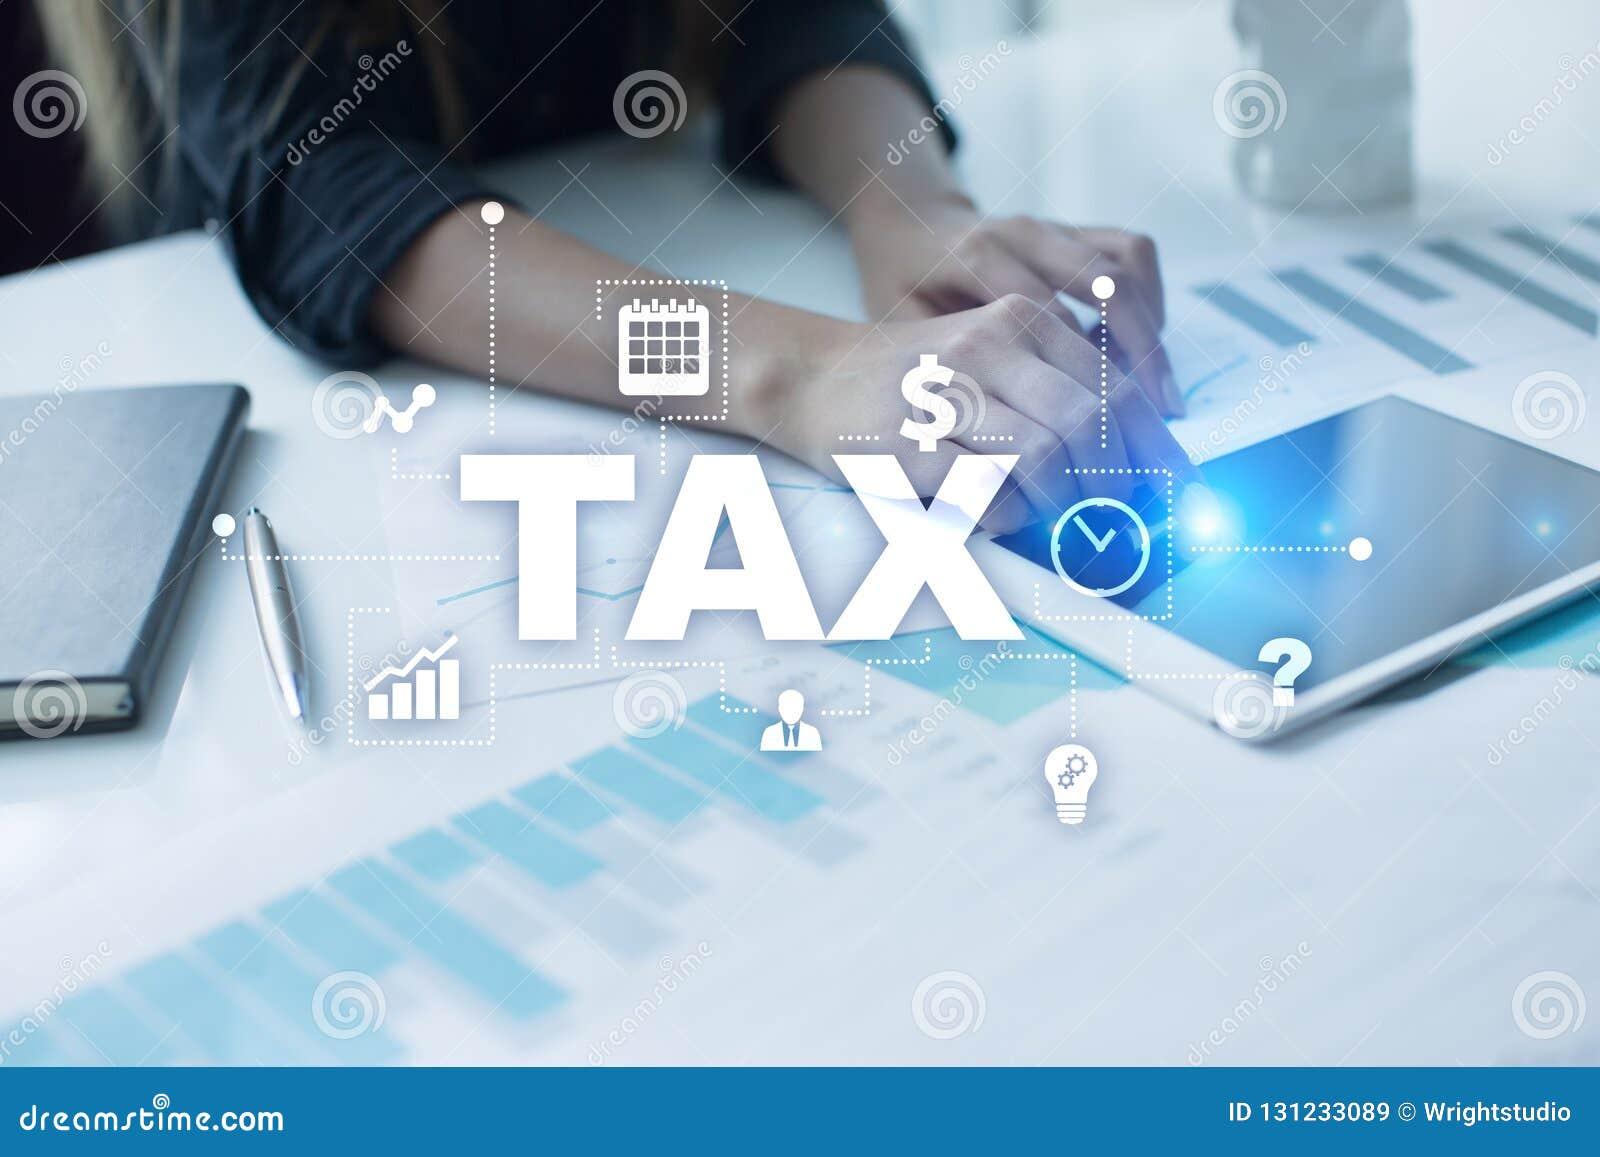 Концепция НАЛОГА оплаченная индивидуалами и корпорациями vat Доход и налог на личное состояние